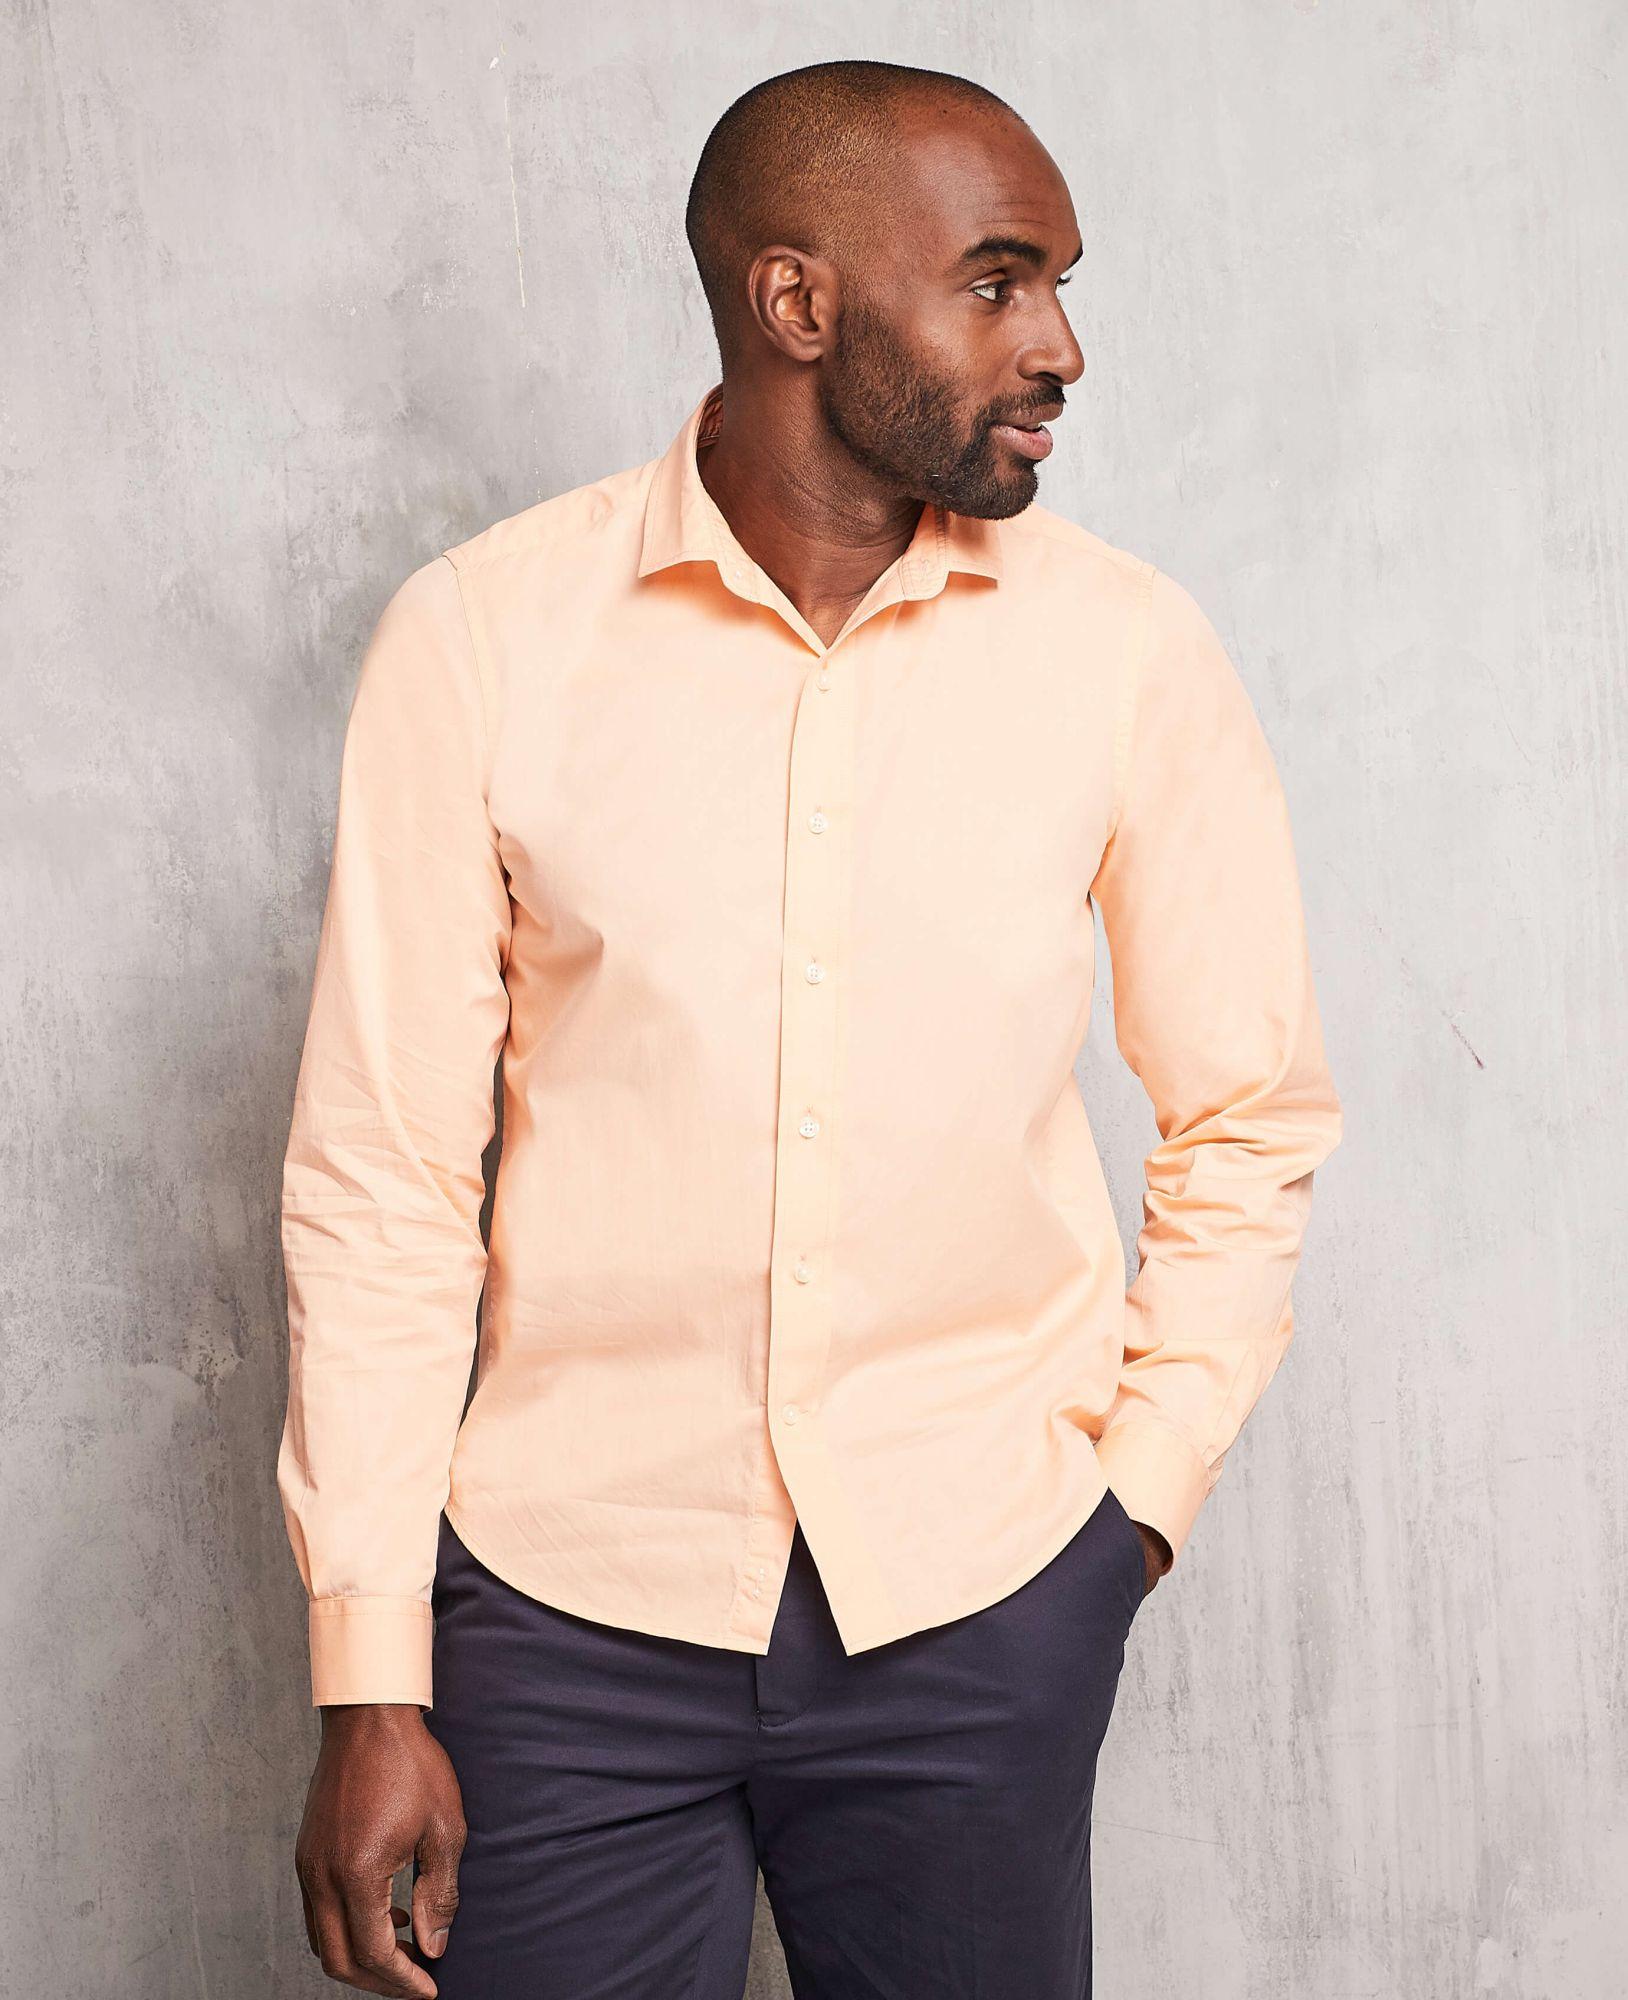 Men's Tops Peach Twill Slim Fit Shirt in Shorter Length M Lengthen by 2